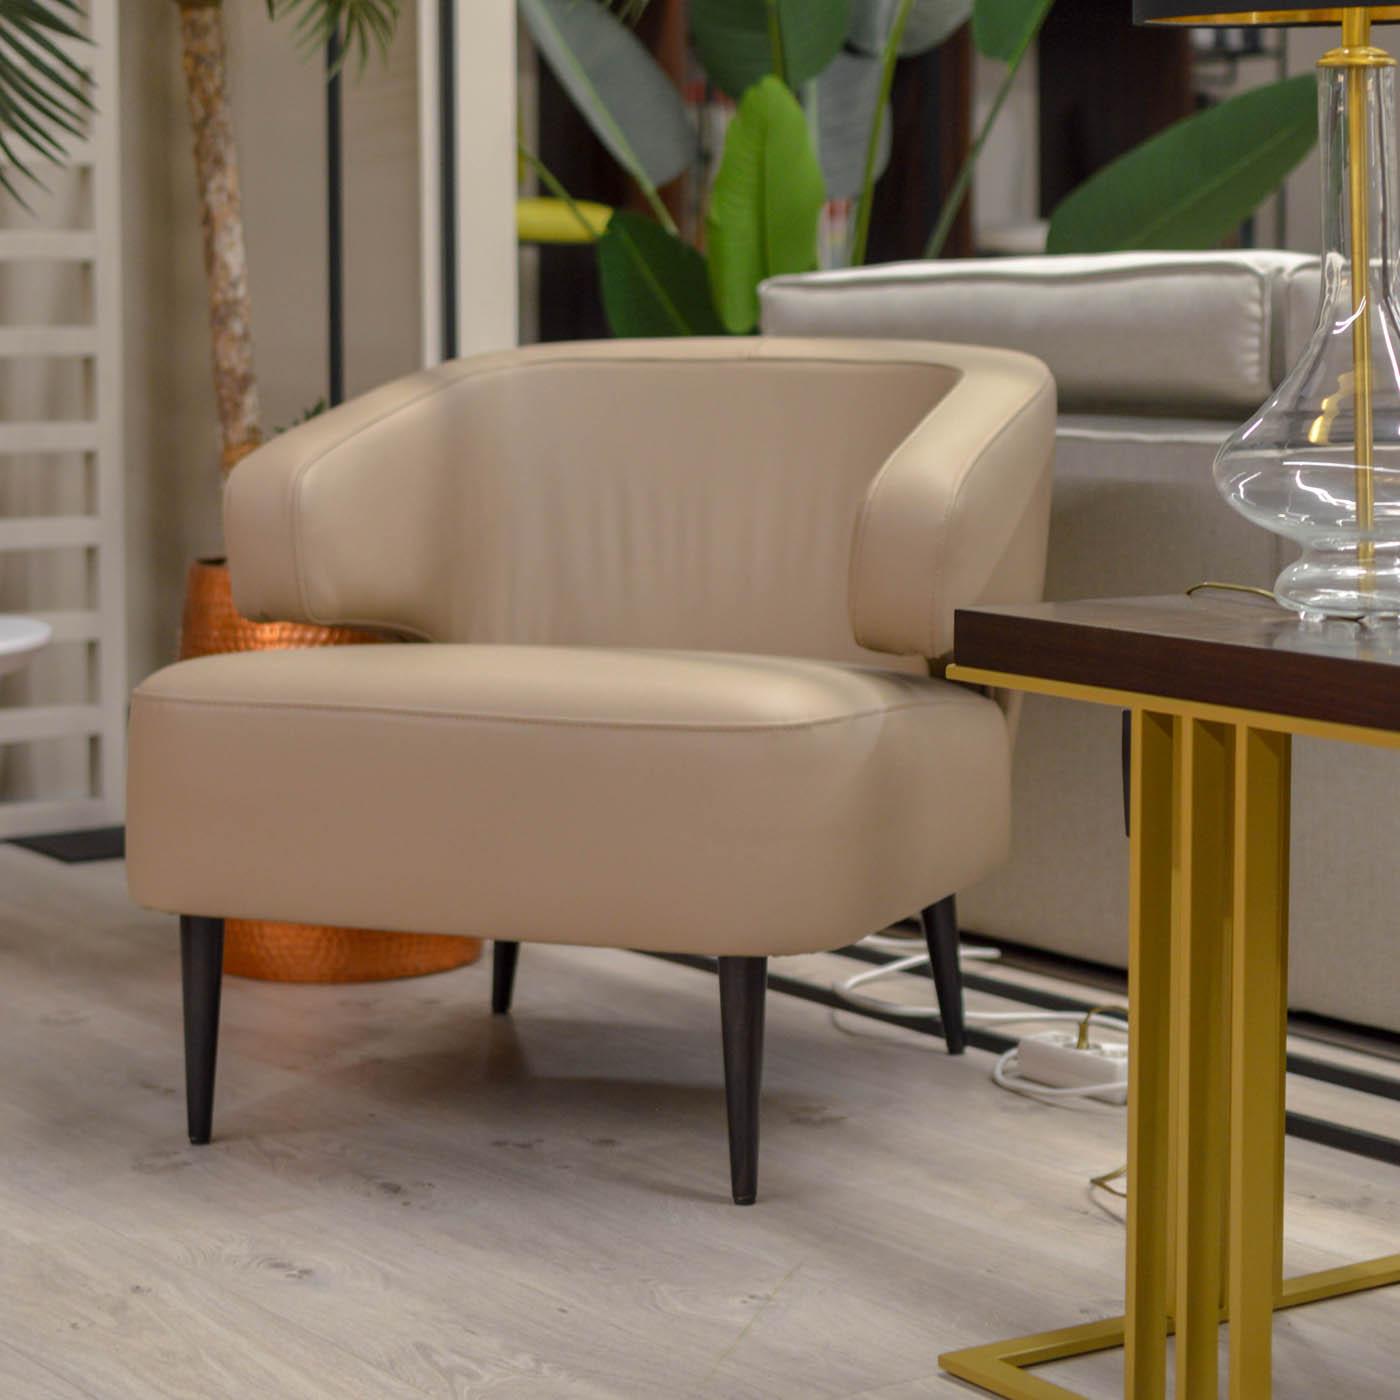 cadeira gemini - promoçoes escaldantes - domkapa